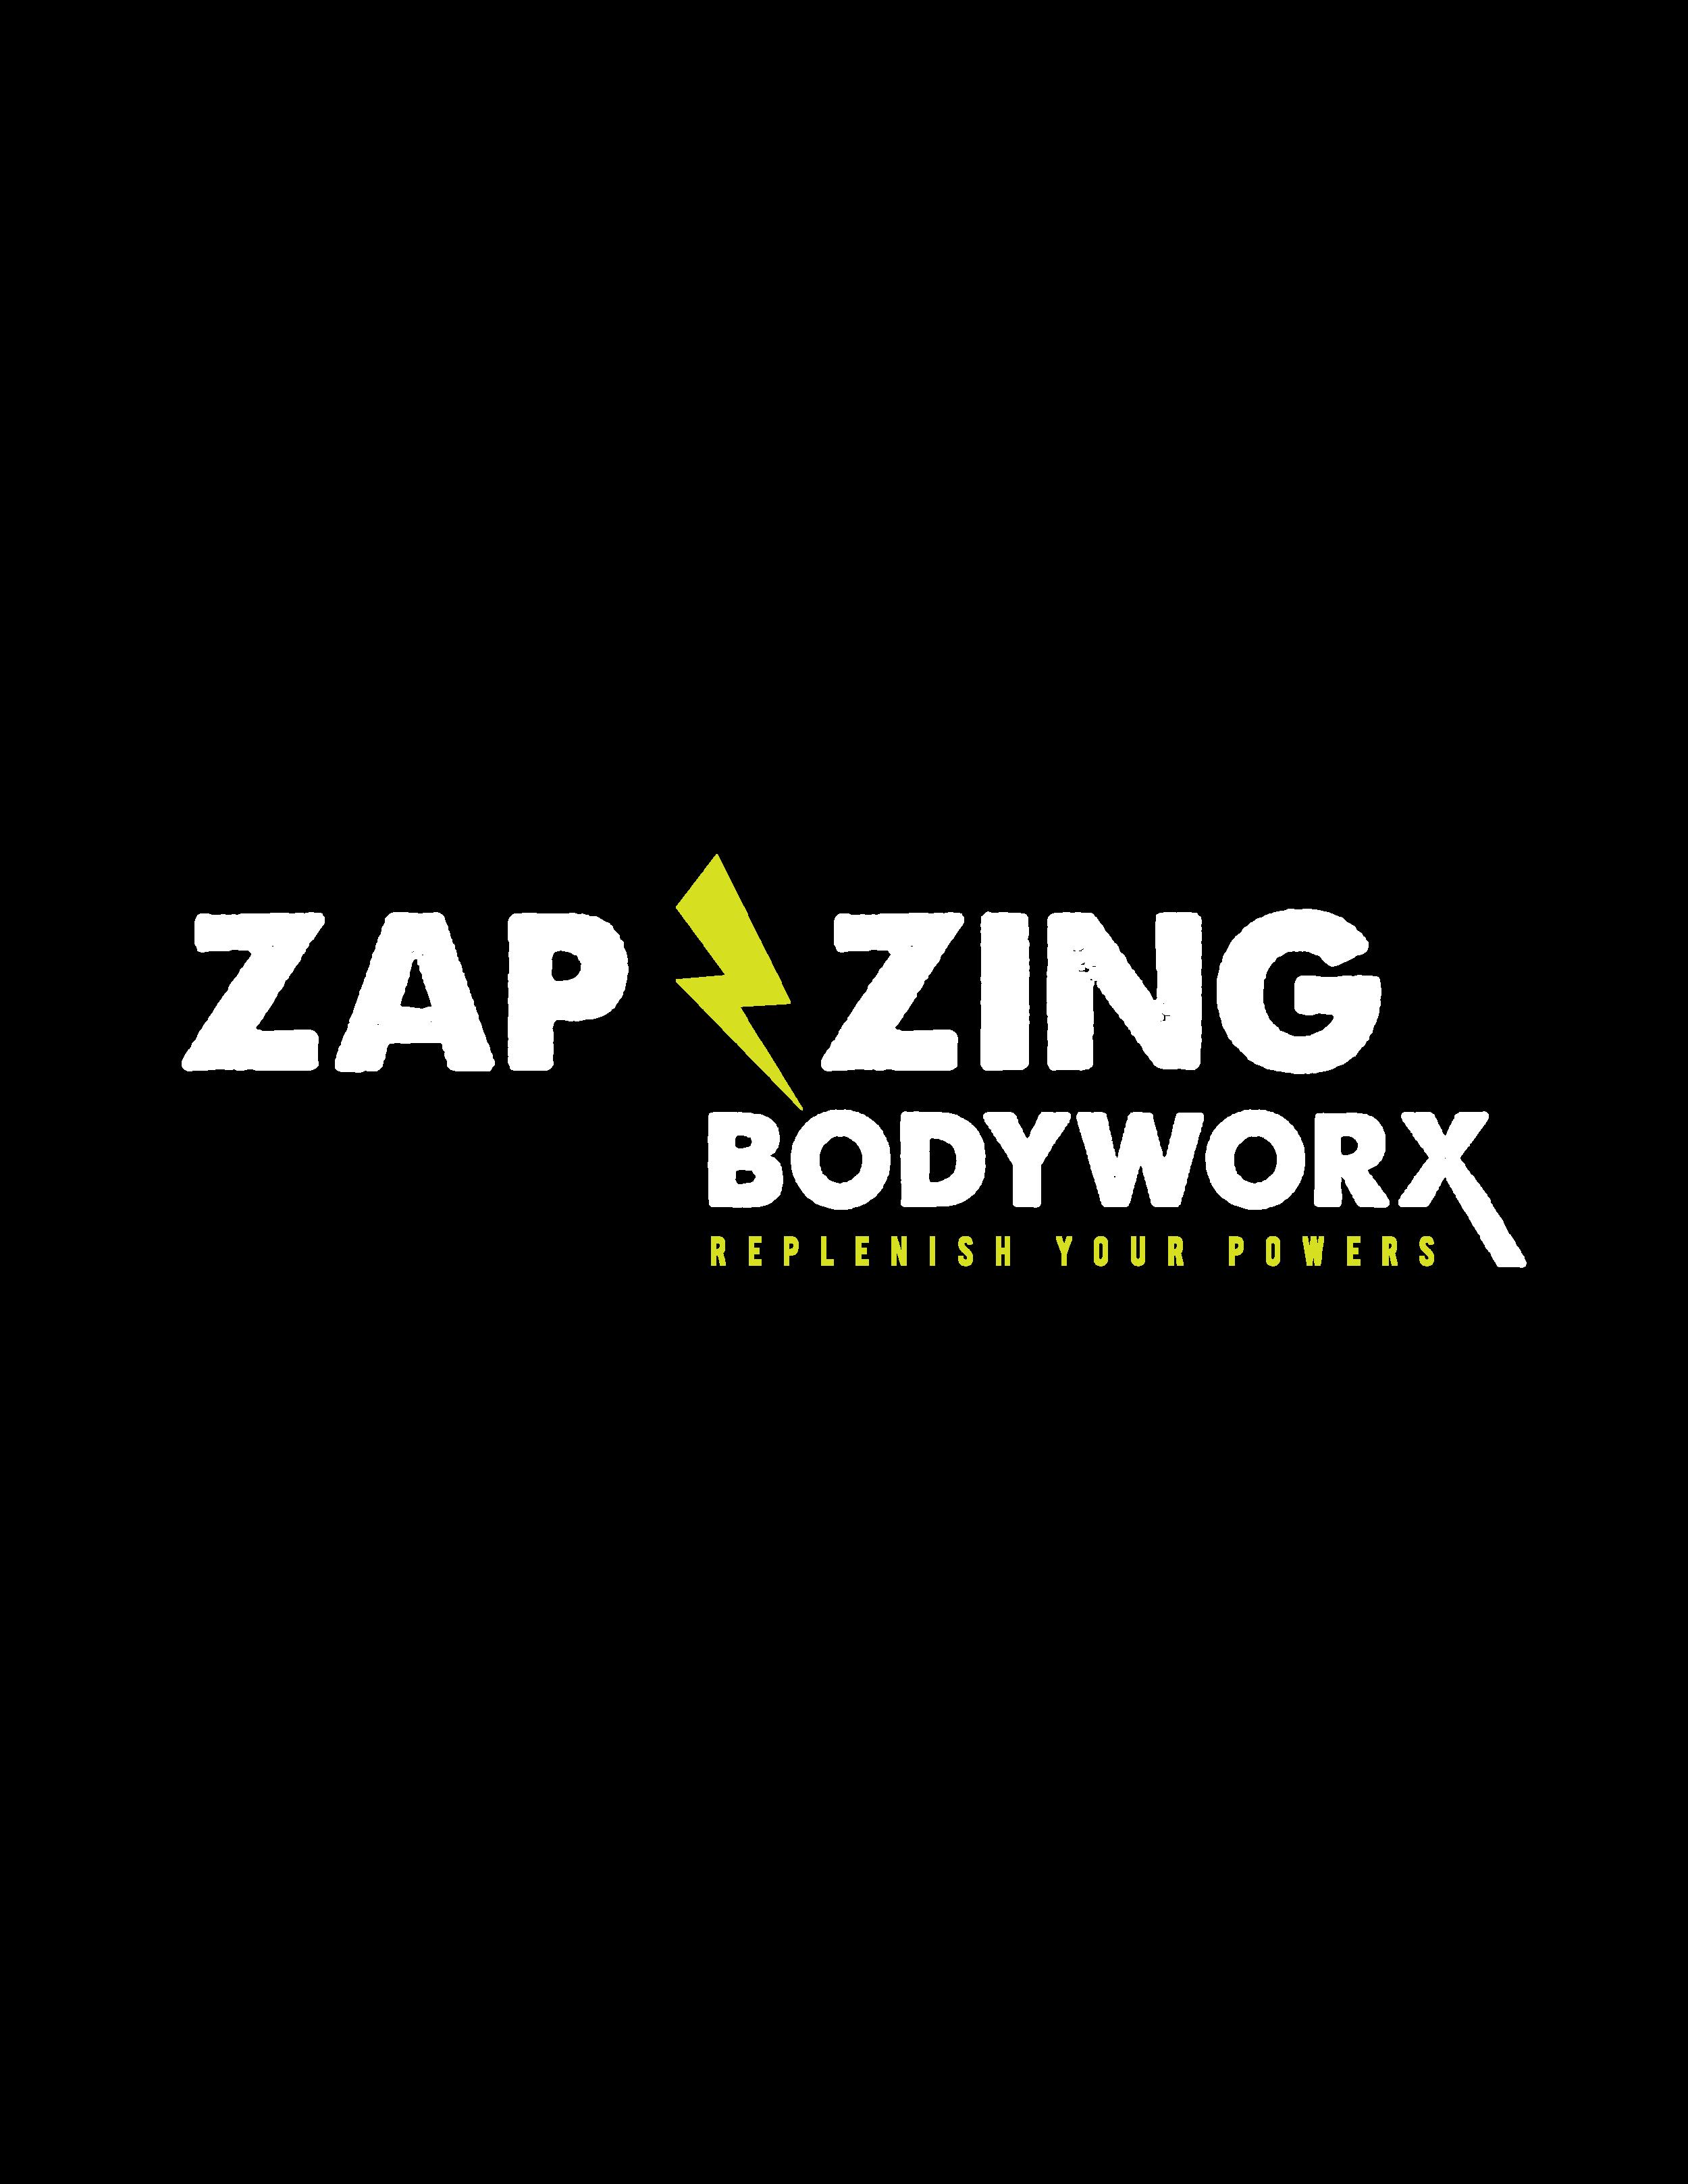 ZapZingBodyWorx-Logo-horizontal-dk-bkgd.jpg